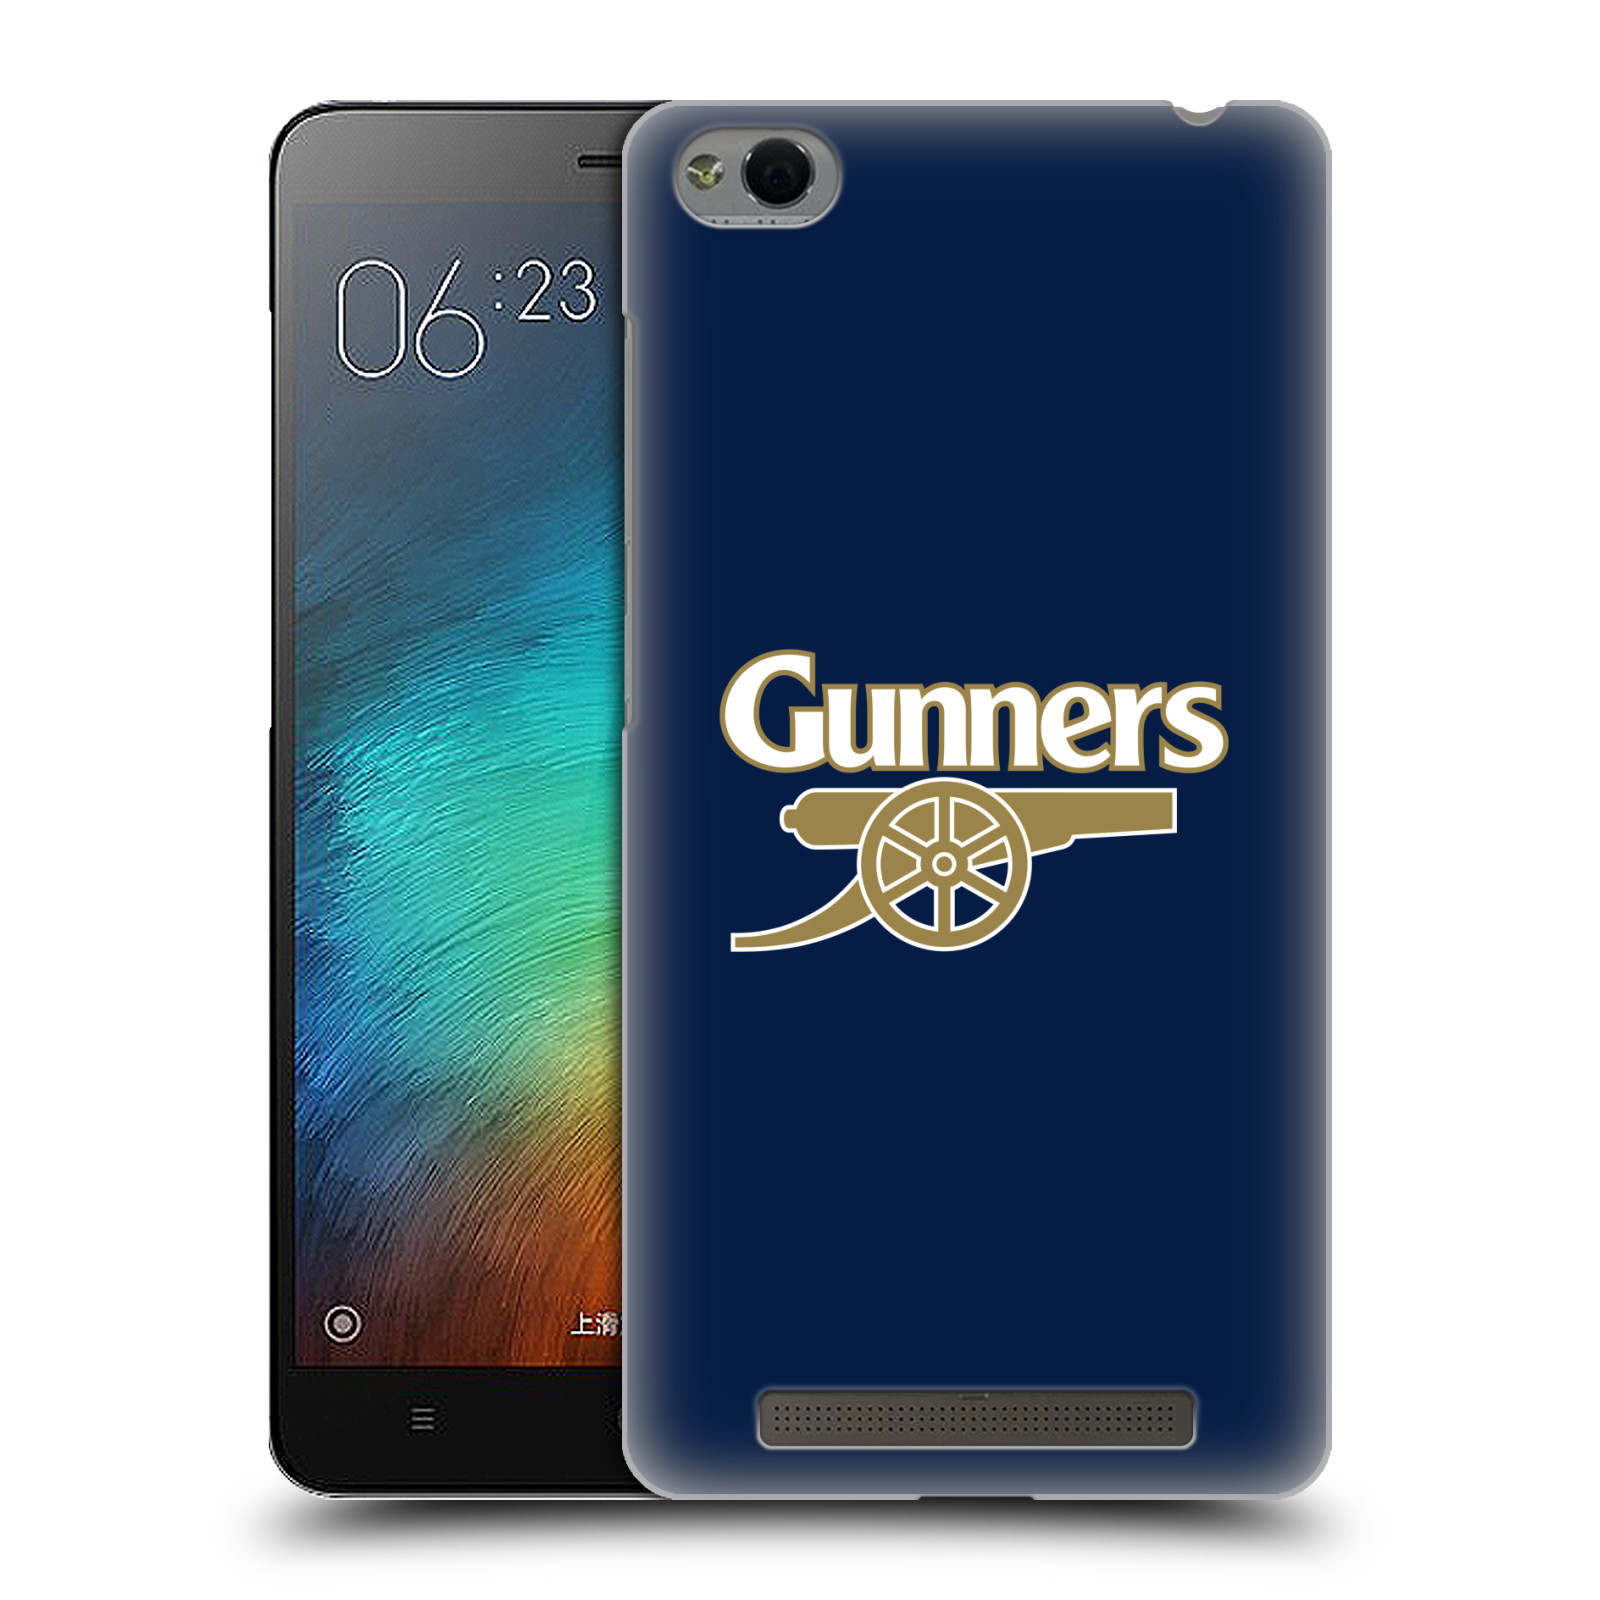 Plastové pouzdro na mobil Xiaomi Redmi 3 - Head Case - Arsenal FC - Gunners